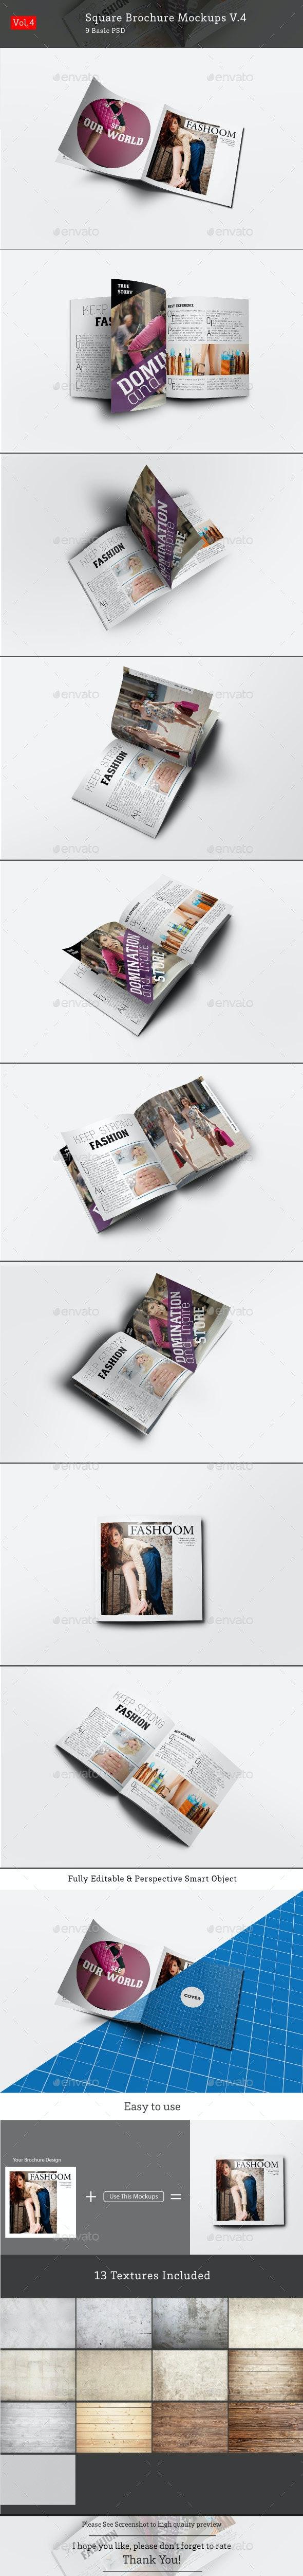 Square Brochure Mockups V.4 - Brochures Print